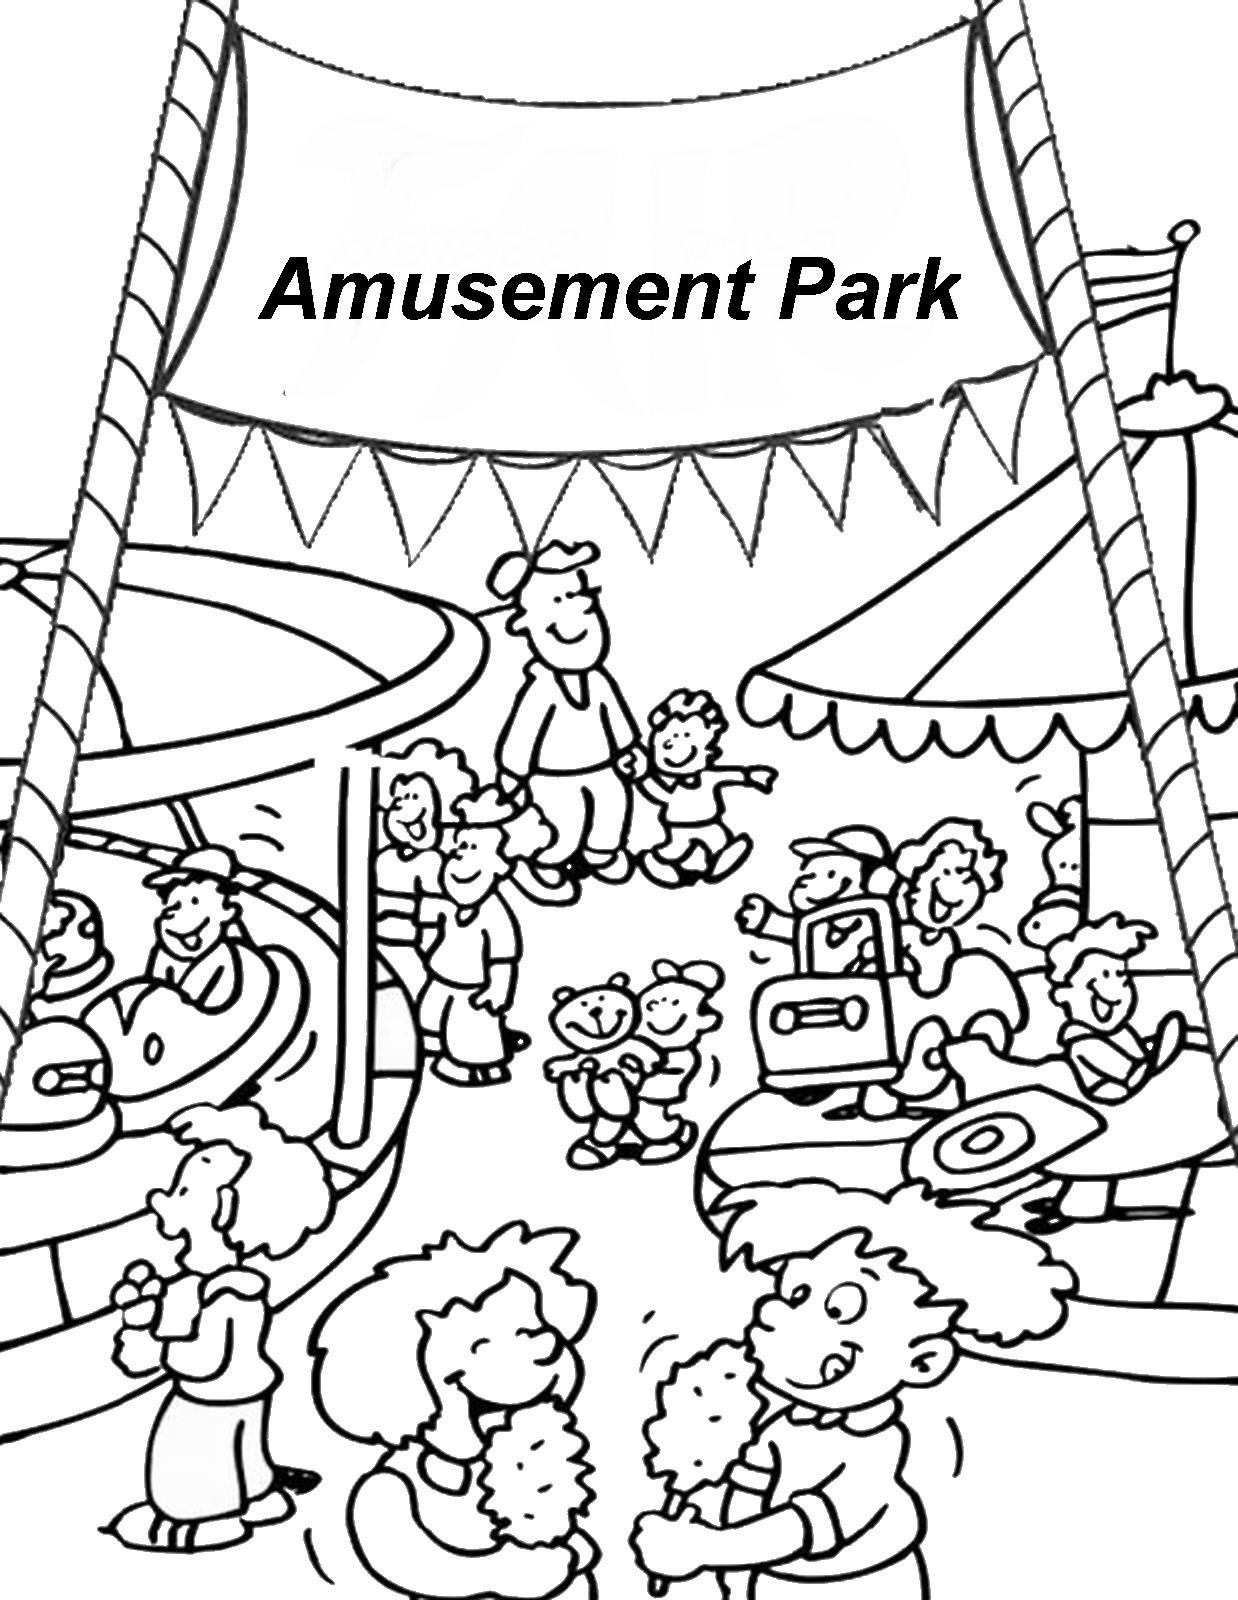 Fun Fair Coloring Pages At Getdrawings Free Download